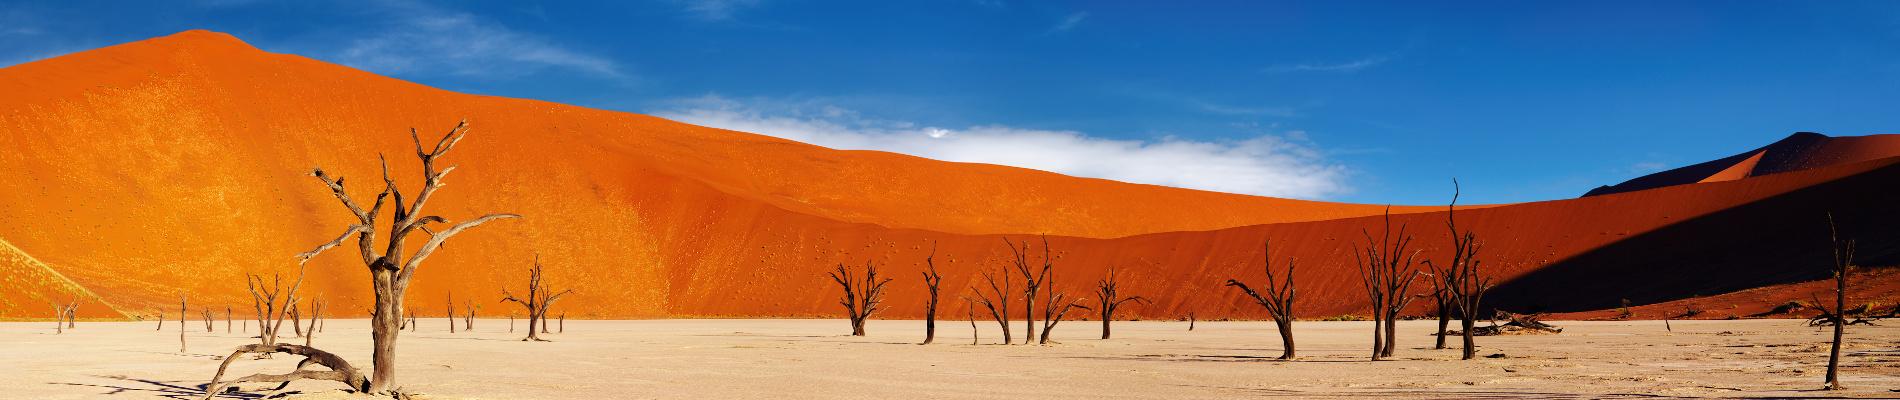 afrique-namibie-desert-st